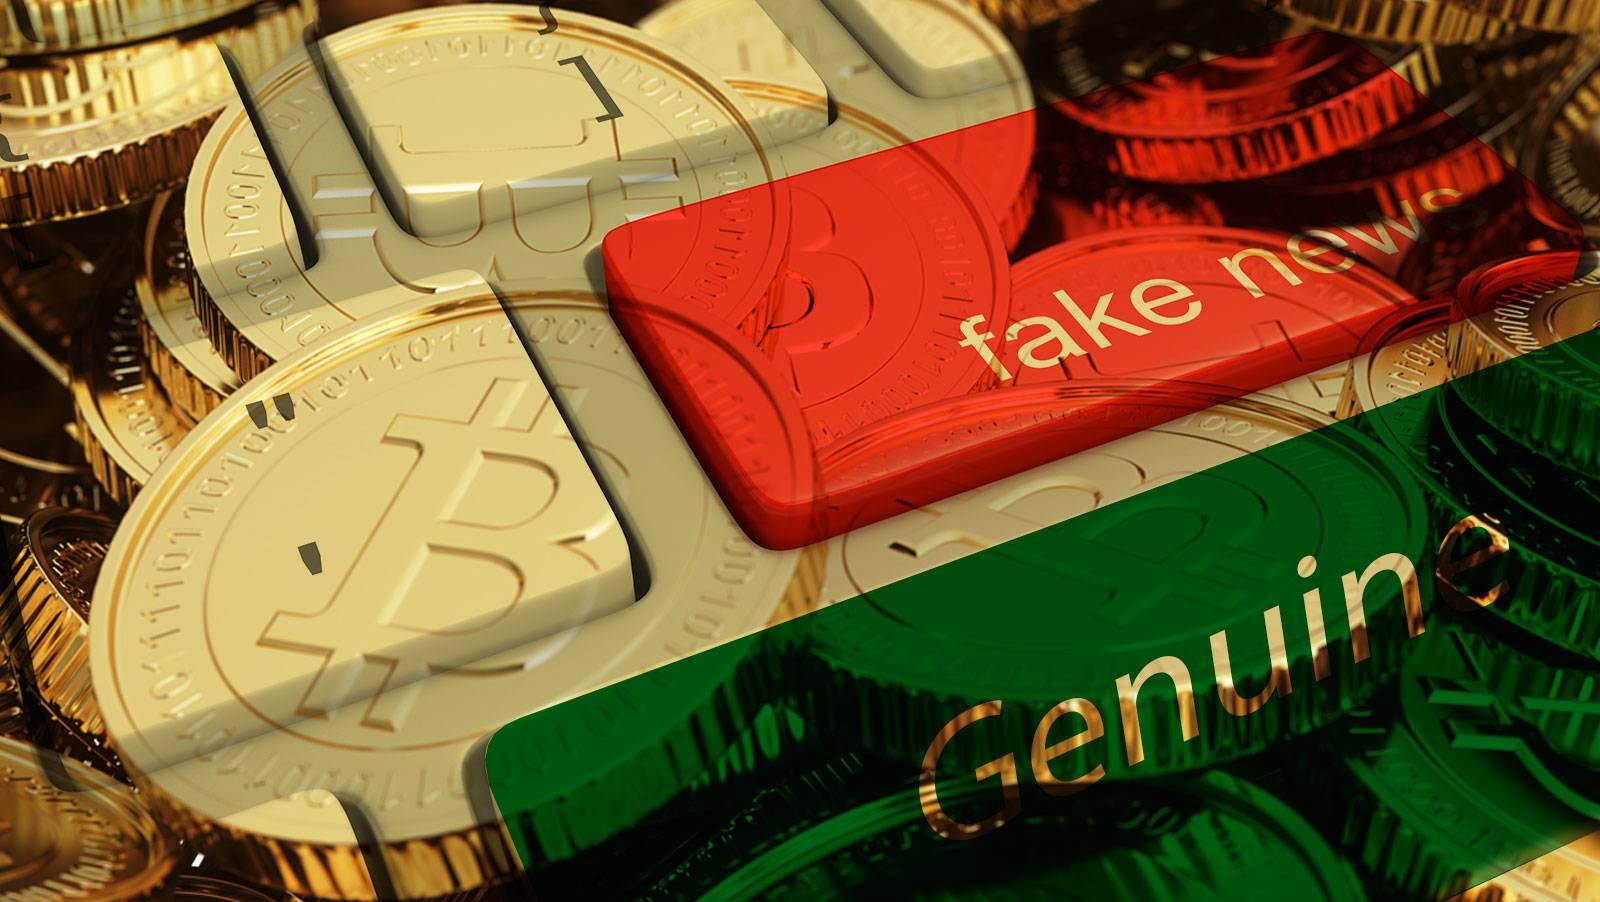 Beware 'fake news' campaign regarding Bitcoin block size